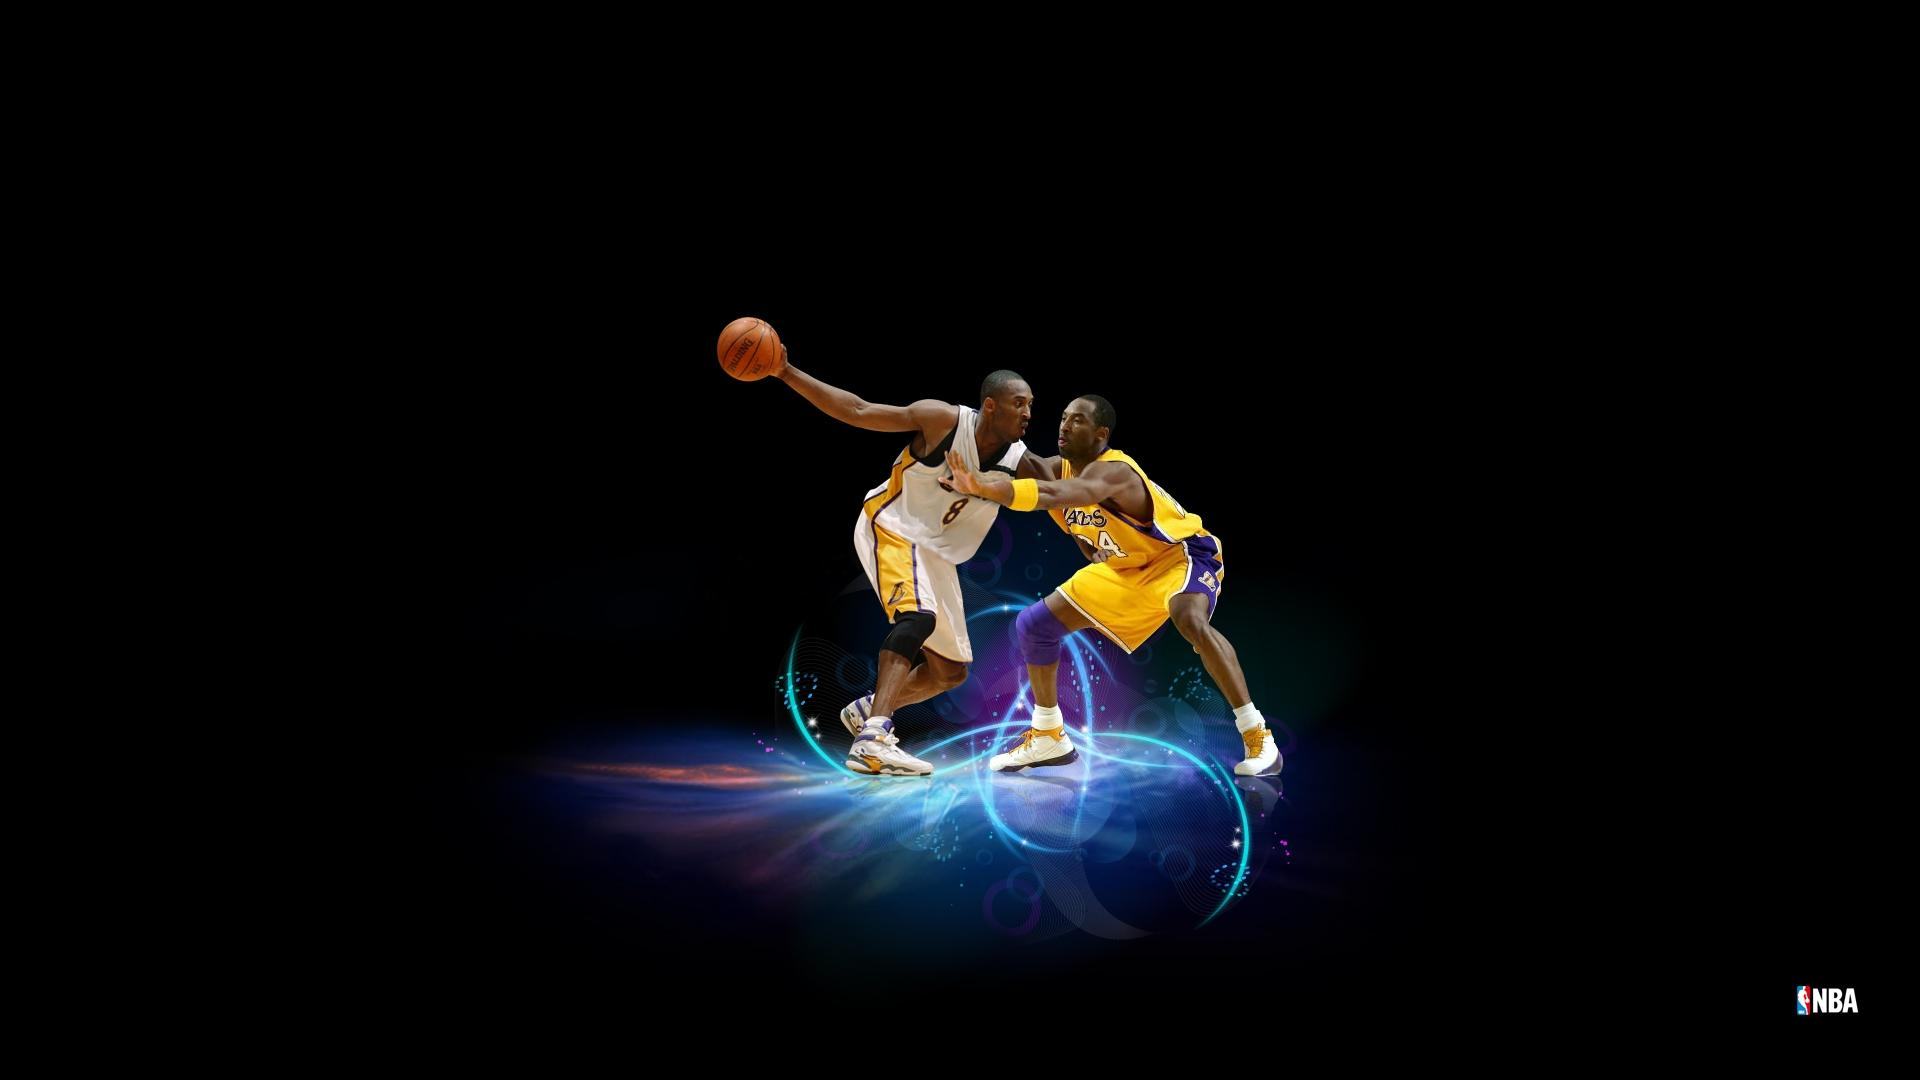 cool basketball wallpaper - sf wallpaper